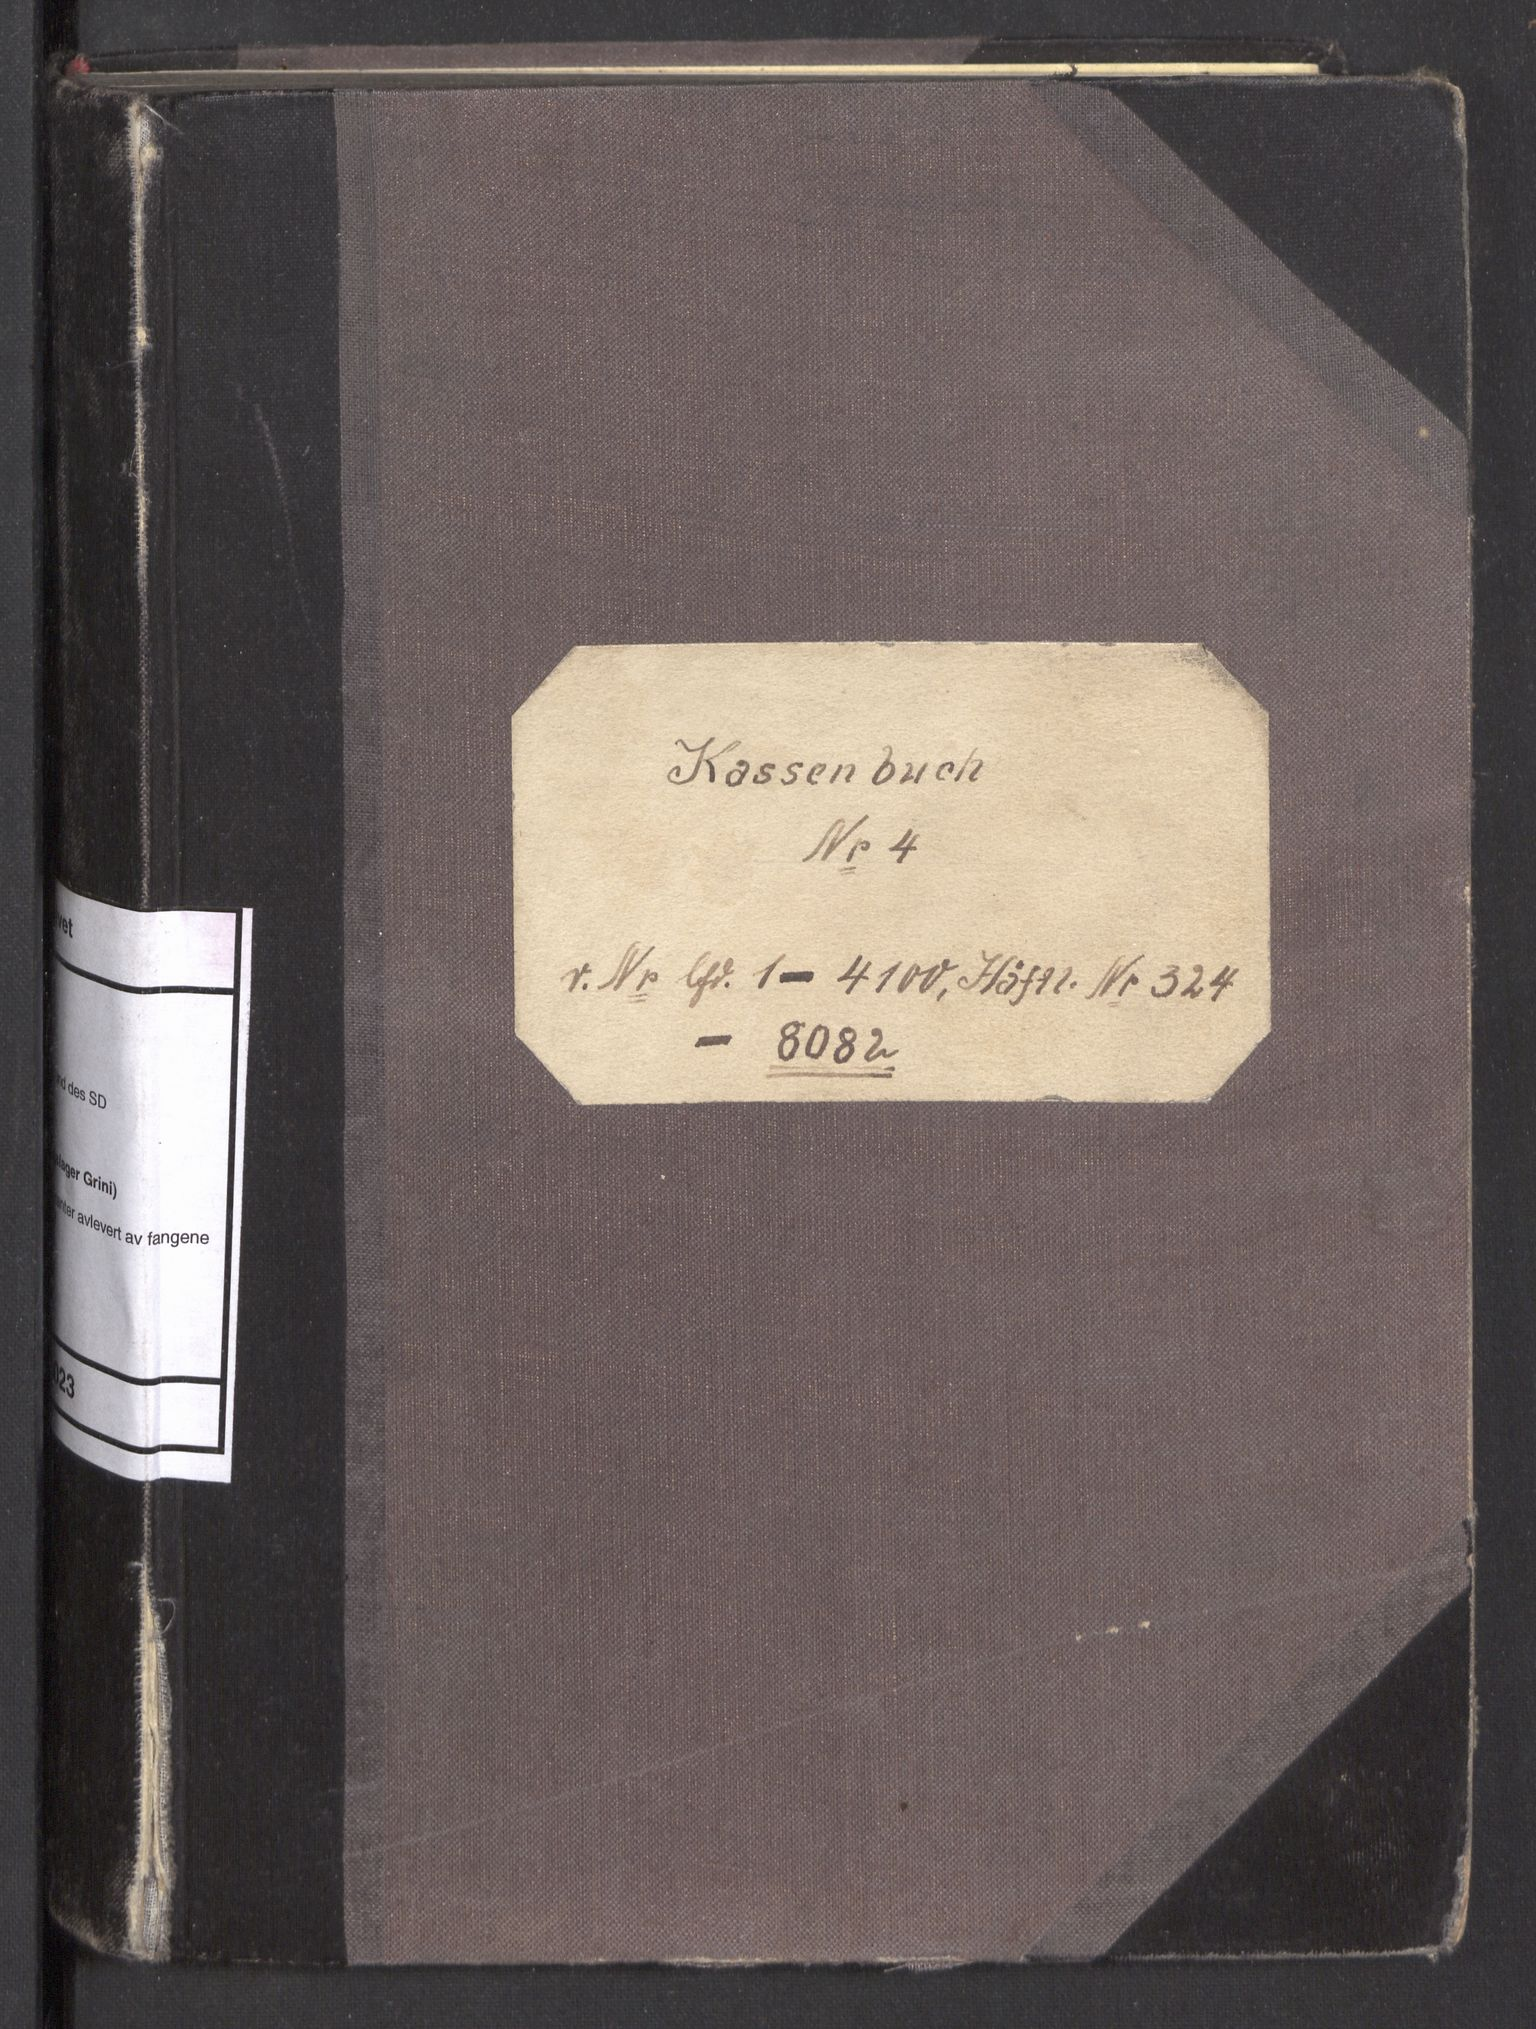 RA, Befehlshaber der Sicherheitspolizei und des SD, F/Fa/Faa/L0023: Kassenbuch nr. 4. Oversikt over kontanter avlevert av fangene  Fangenr. 1-4100. Häftl. Nr. 324-8082, 1941-1943